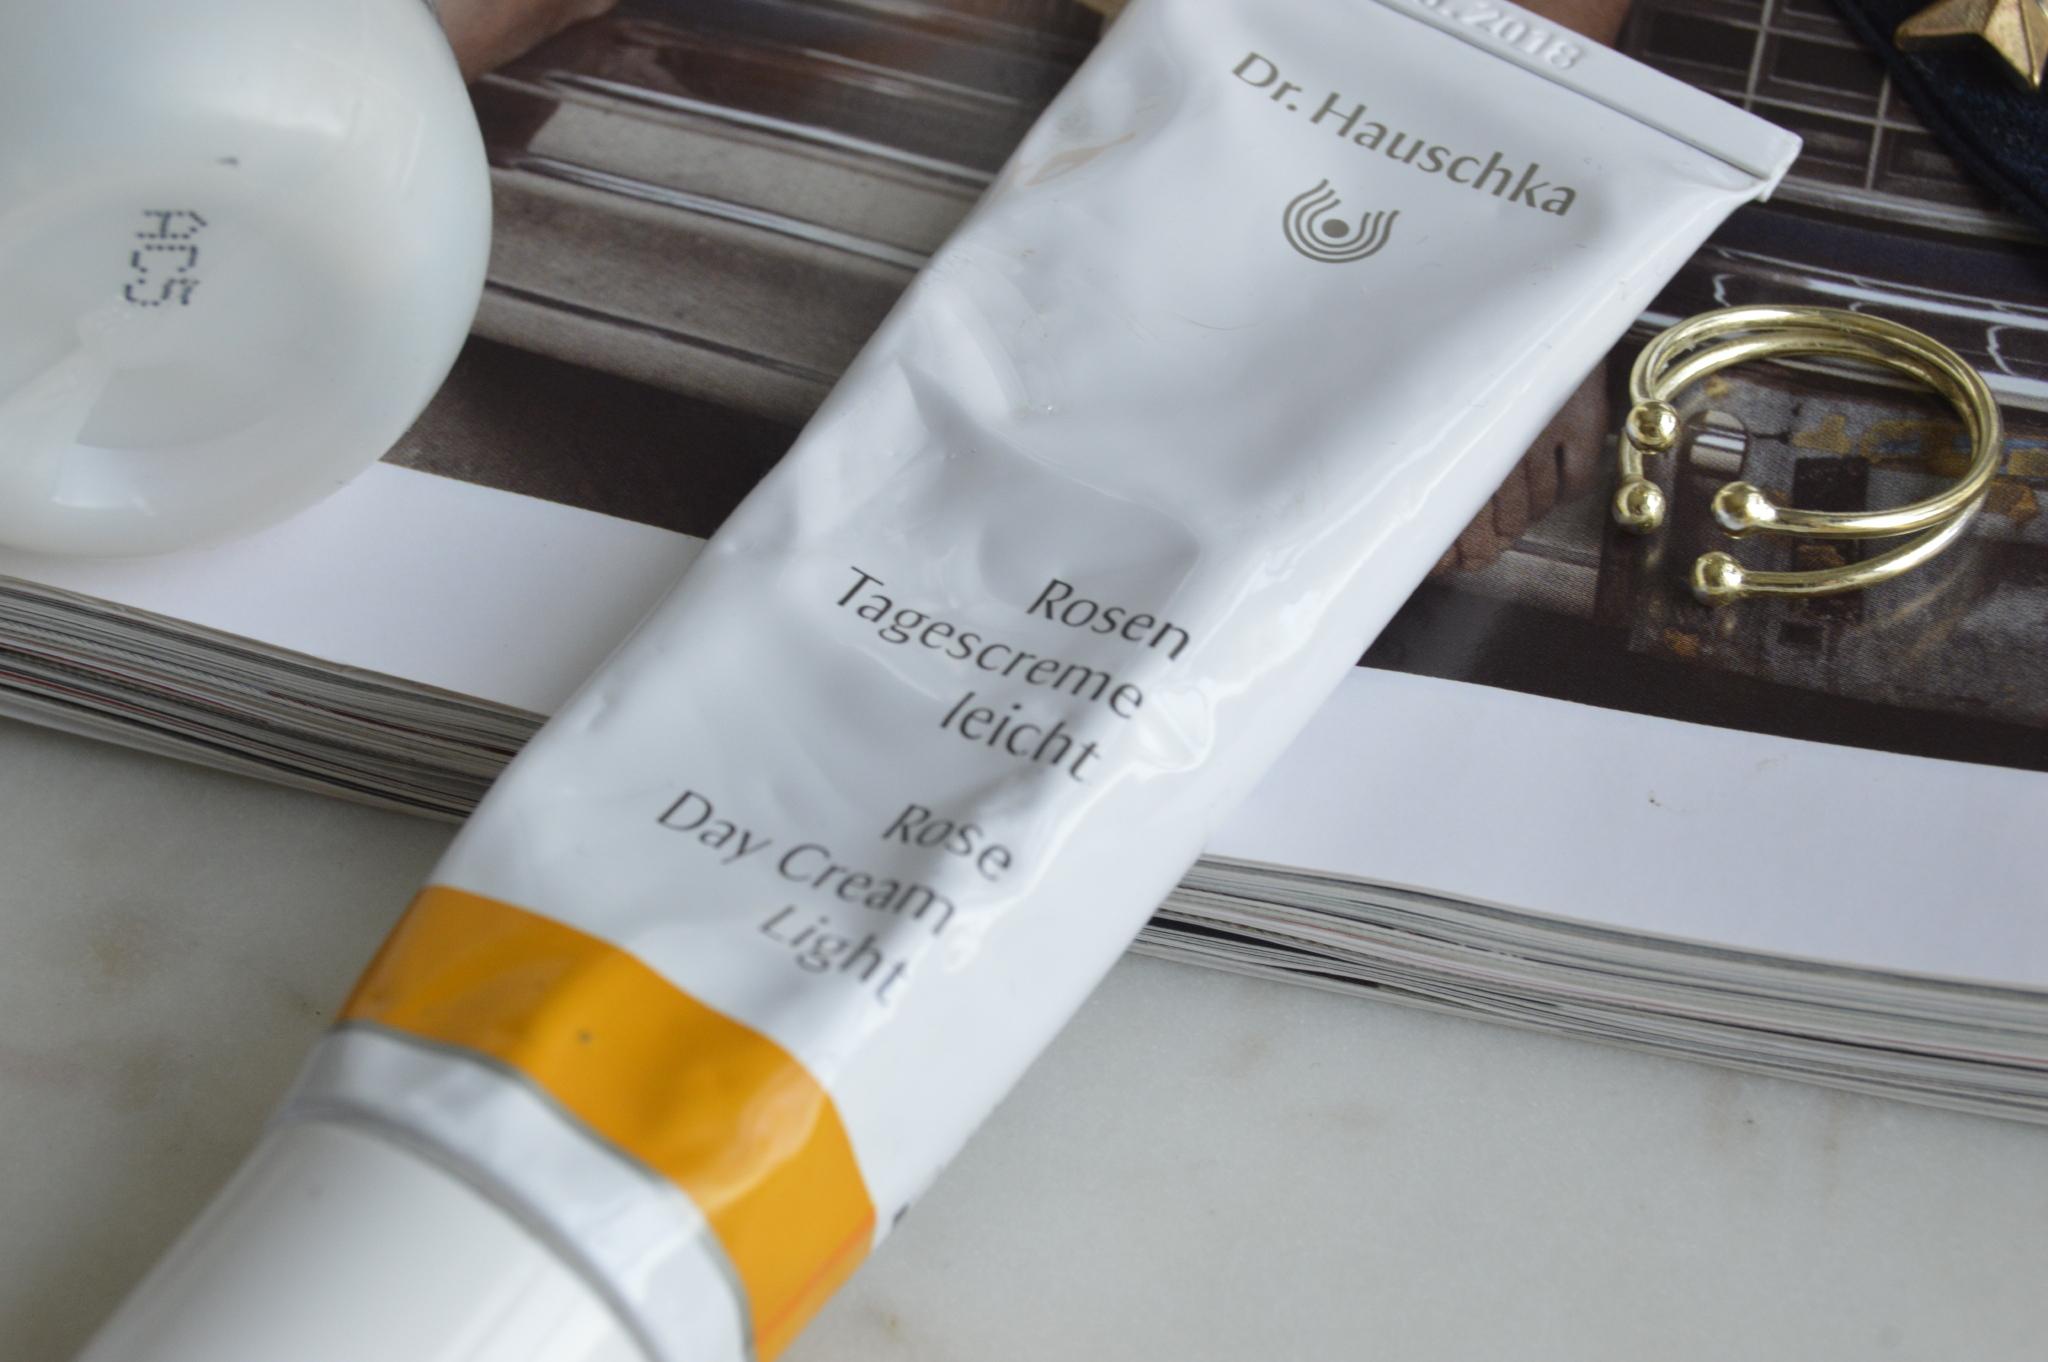 Dr Hauschka Skin Care, the Creative Larder Review, Rose Day Cream Light